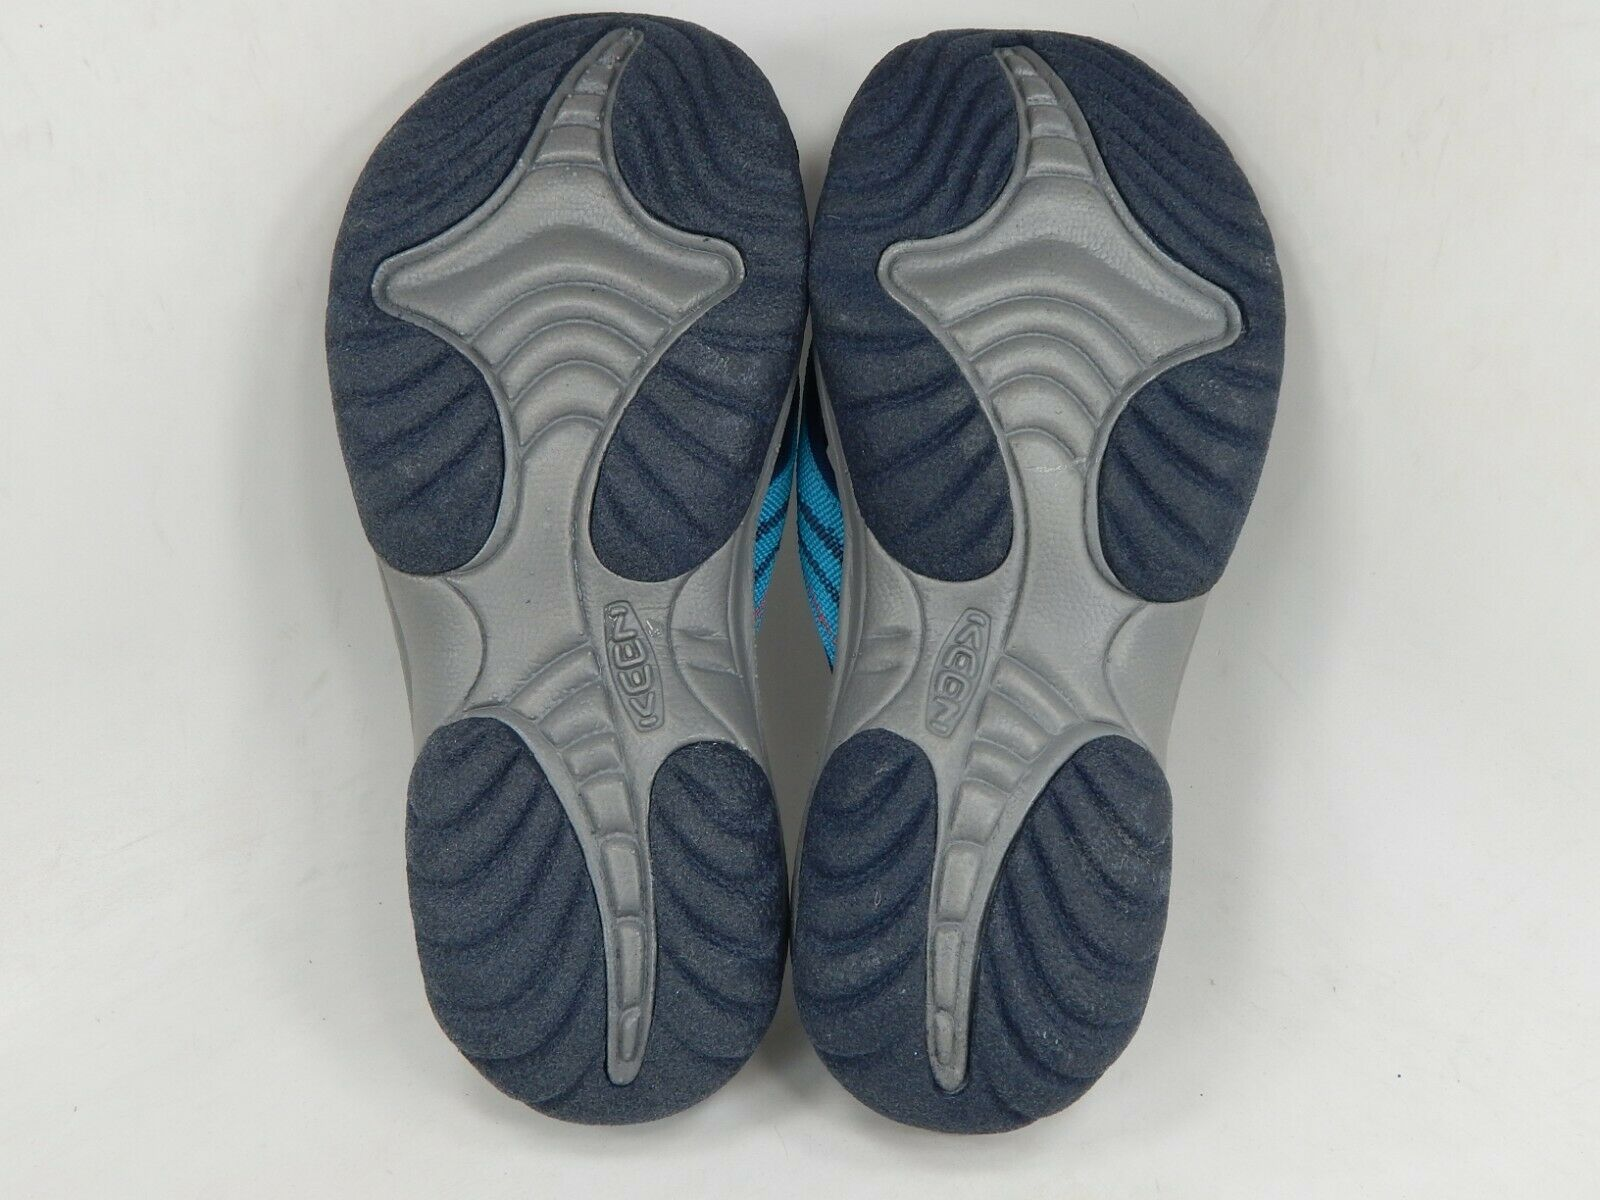 Keen Kona Clapet II Sz US 8 M (B) Eu 38,5 Femmes Sandales Sport Bleu/Vert